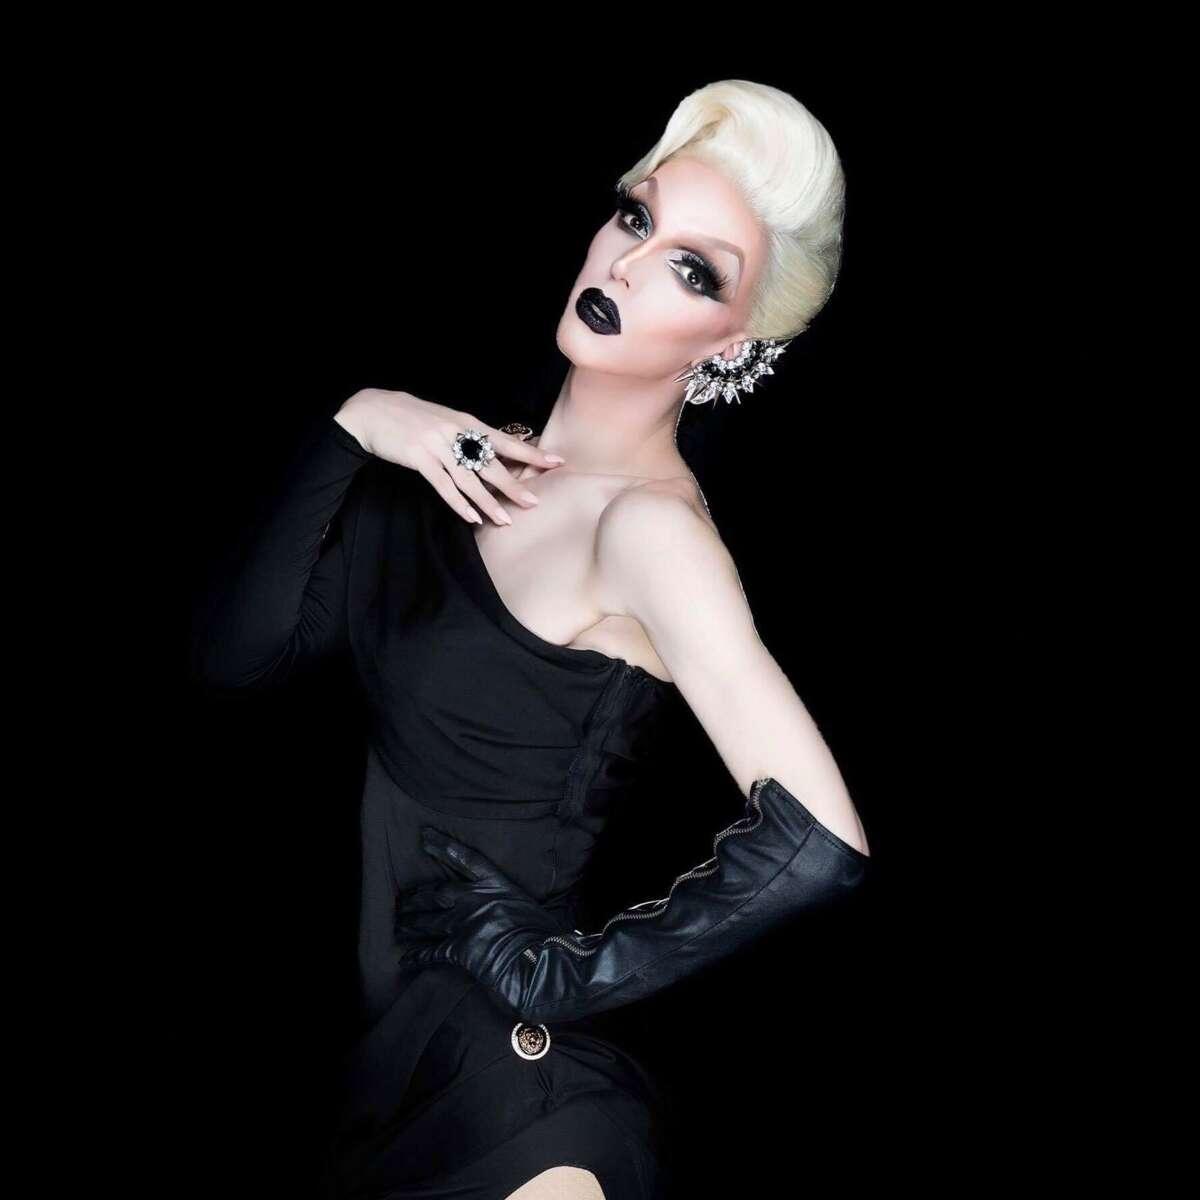 Houston drag queen Chloe Knox has a nonstop schedule.